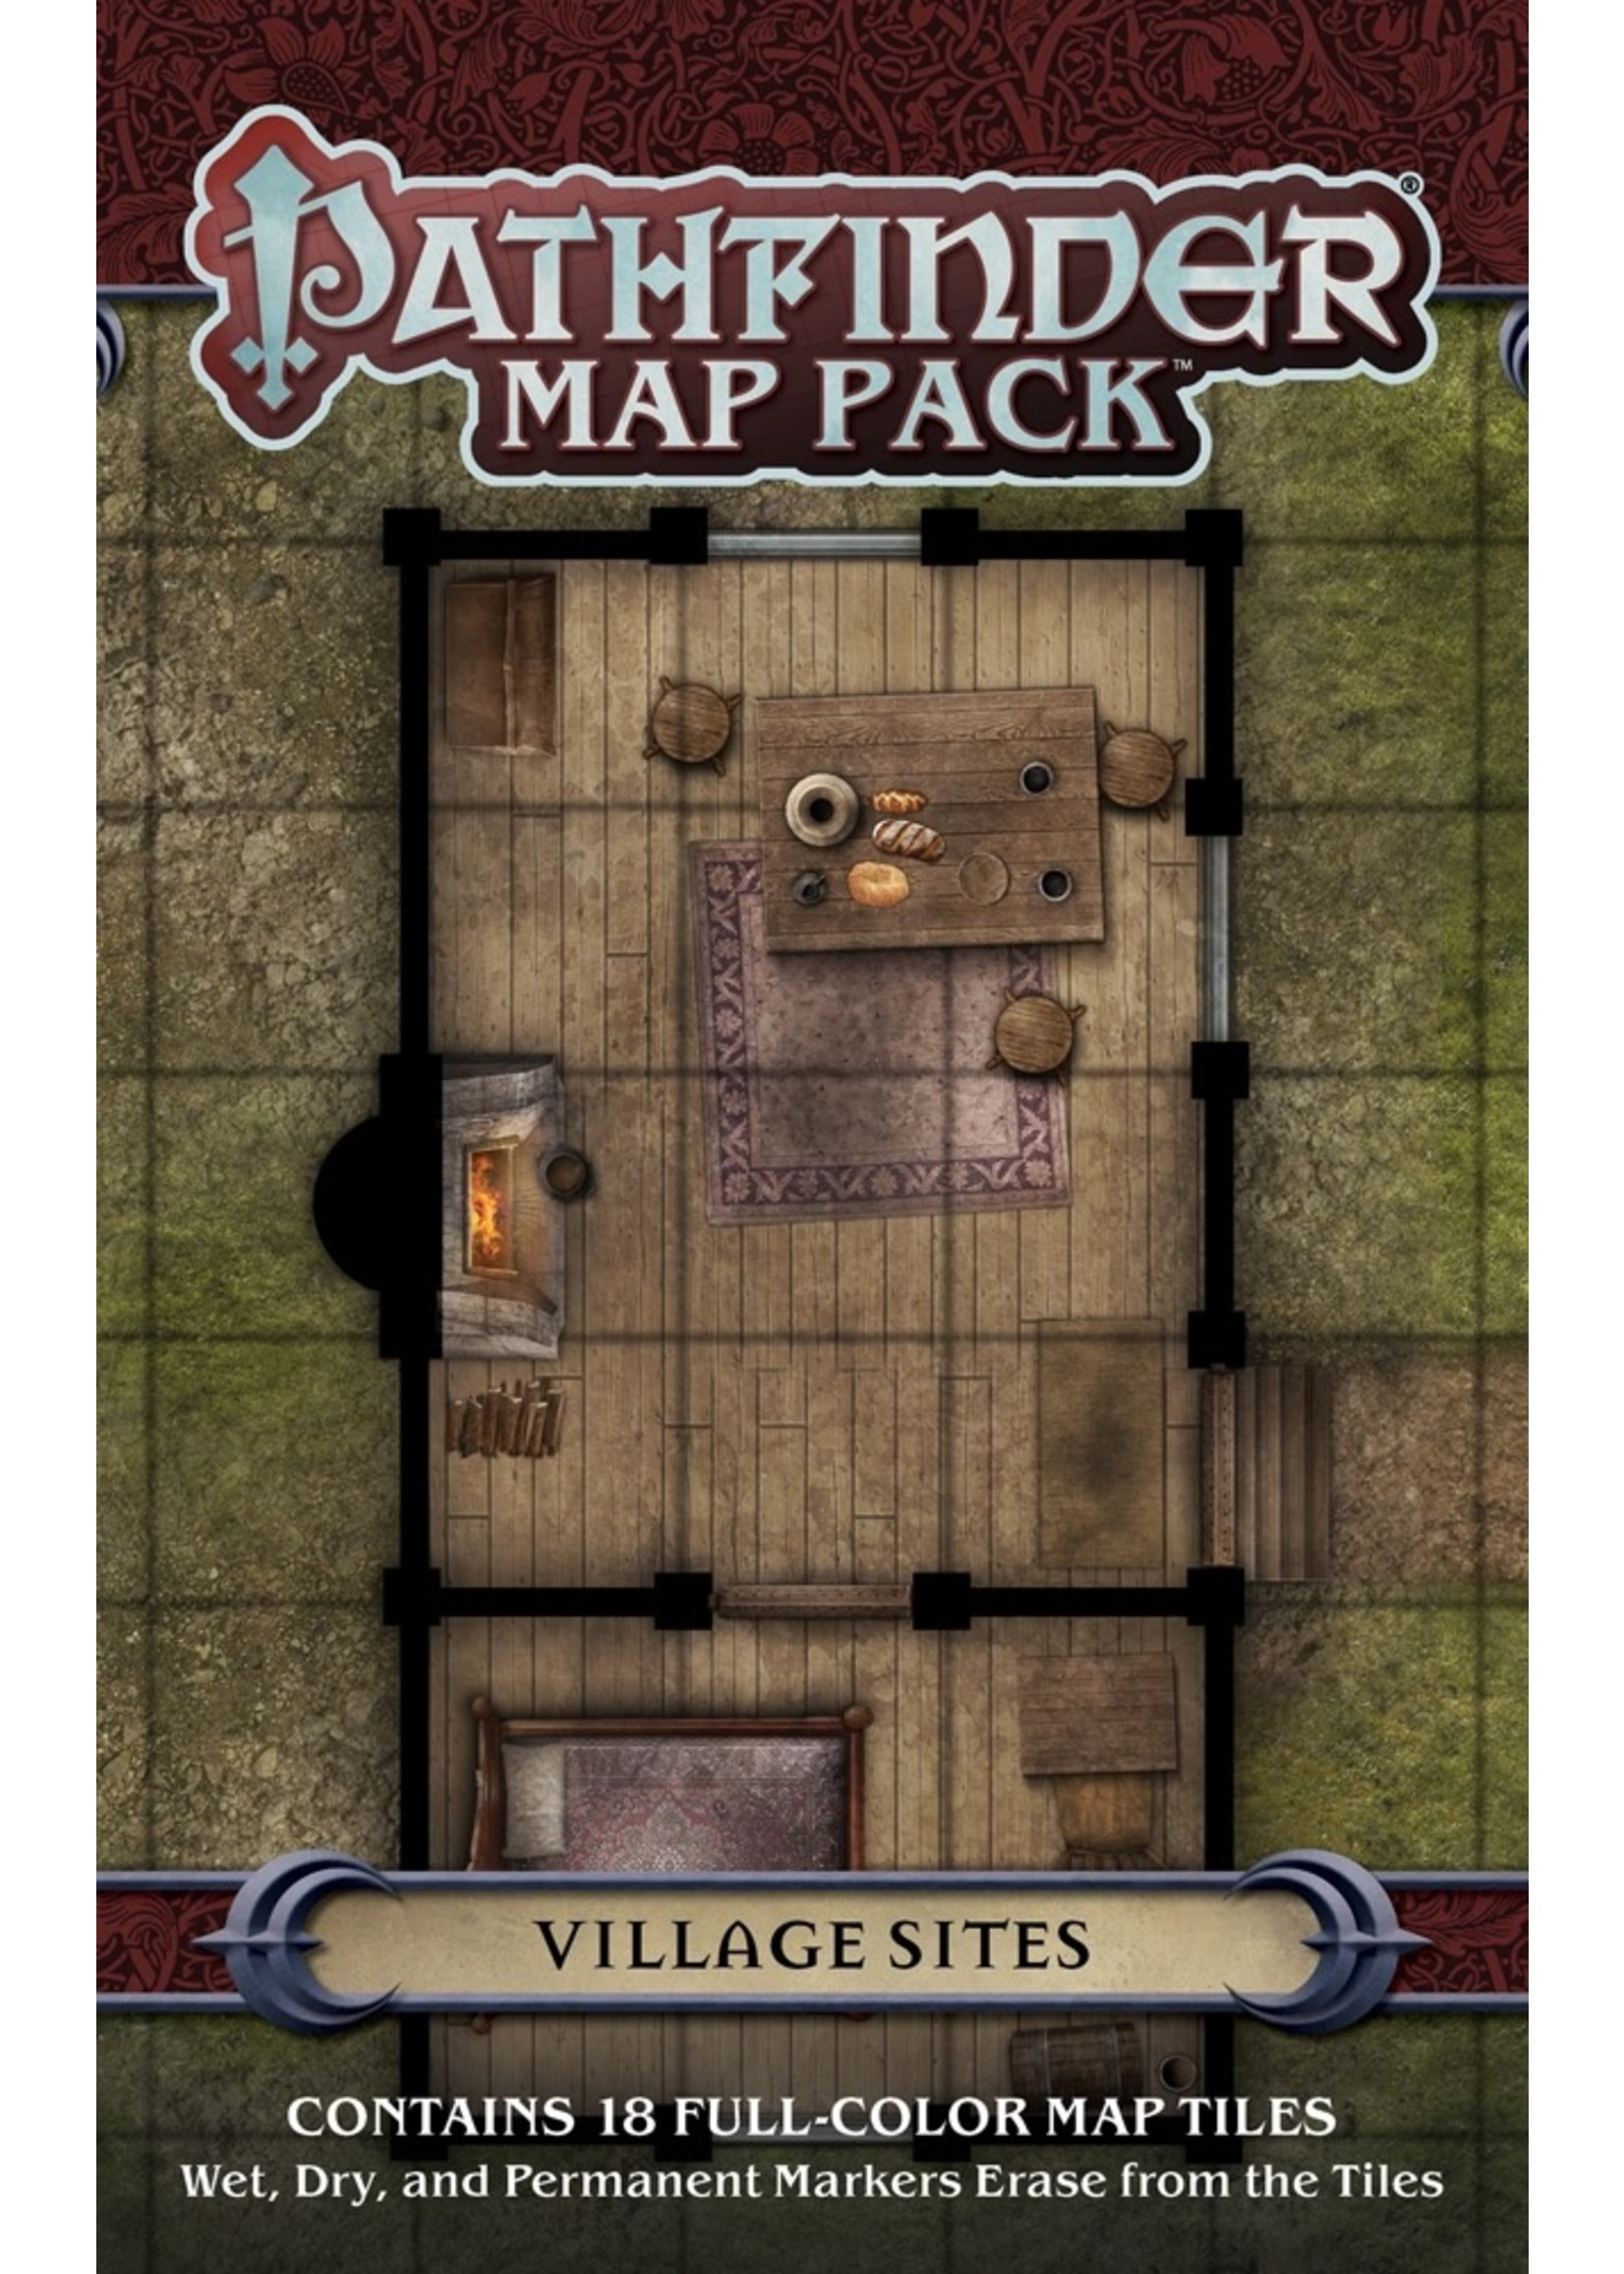 Pathfinder RPG: Map Pack - Village Sites